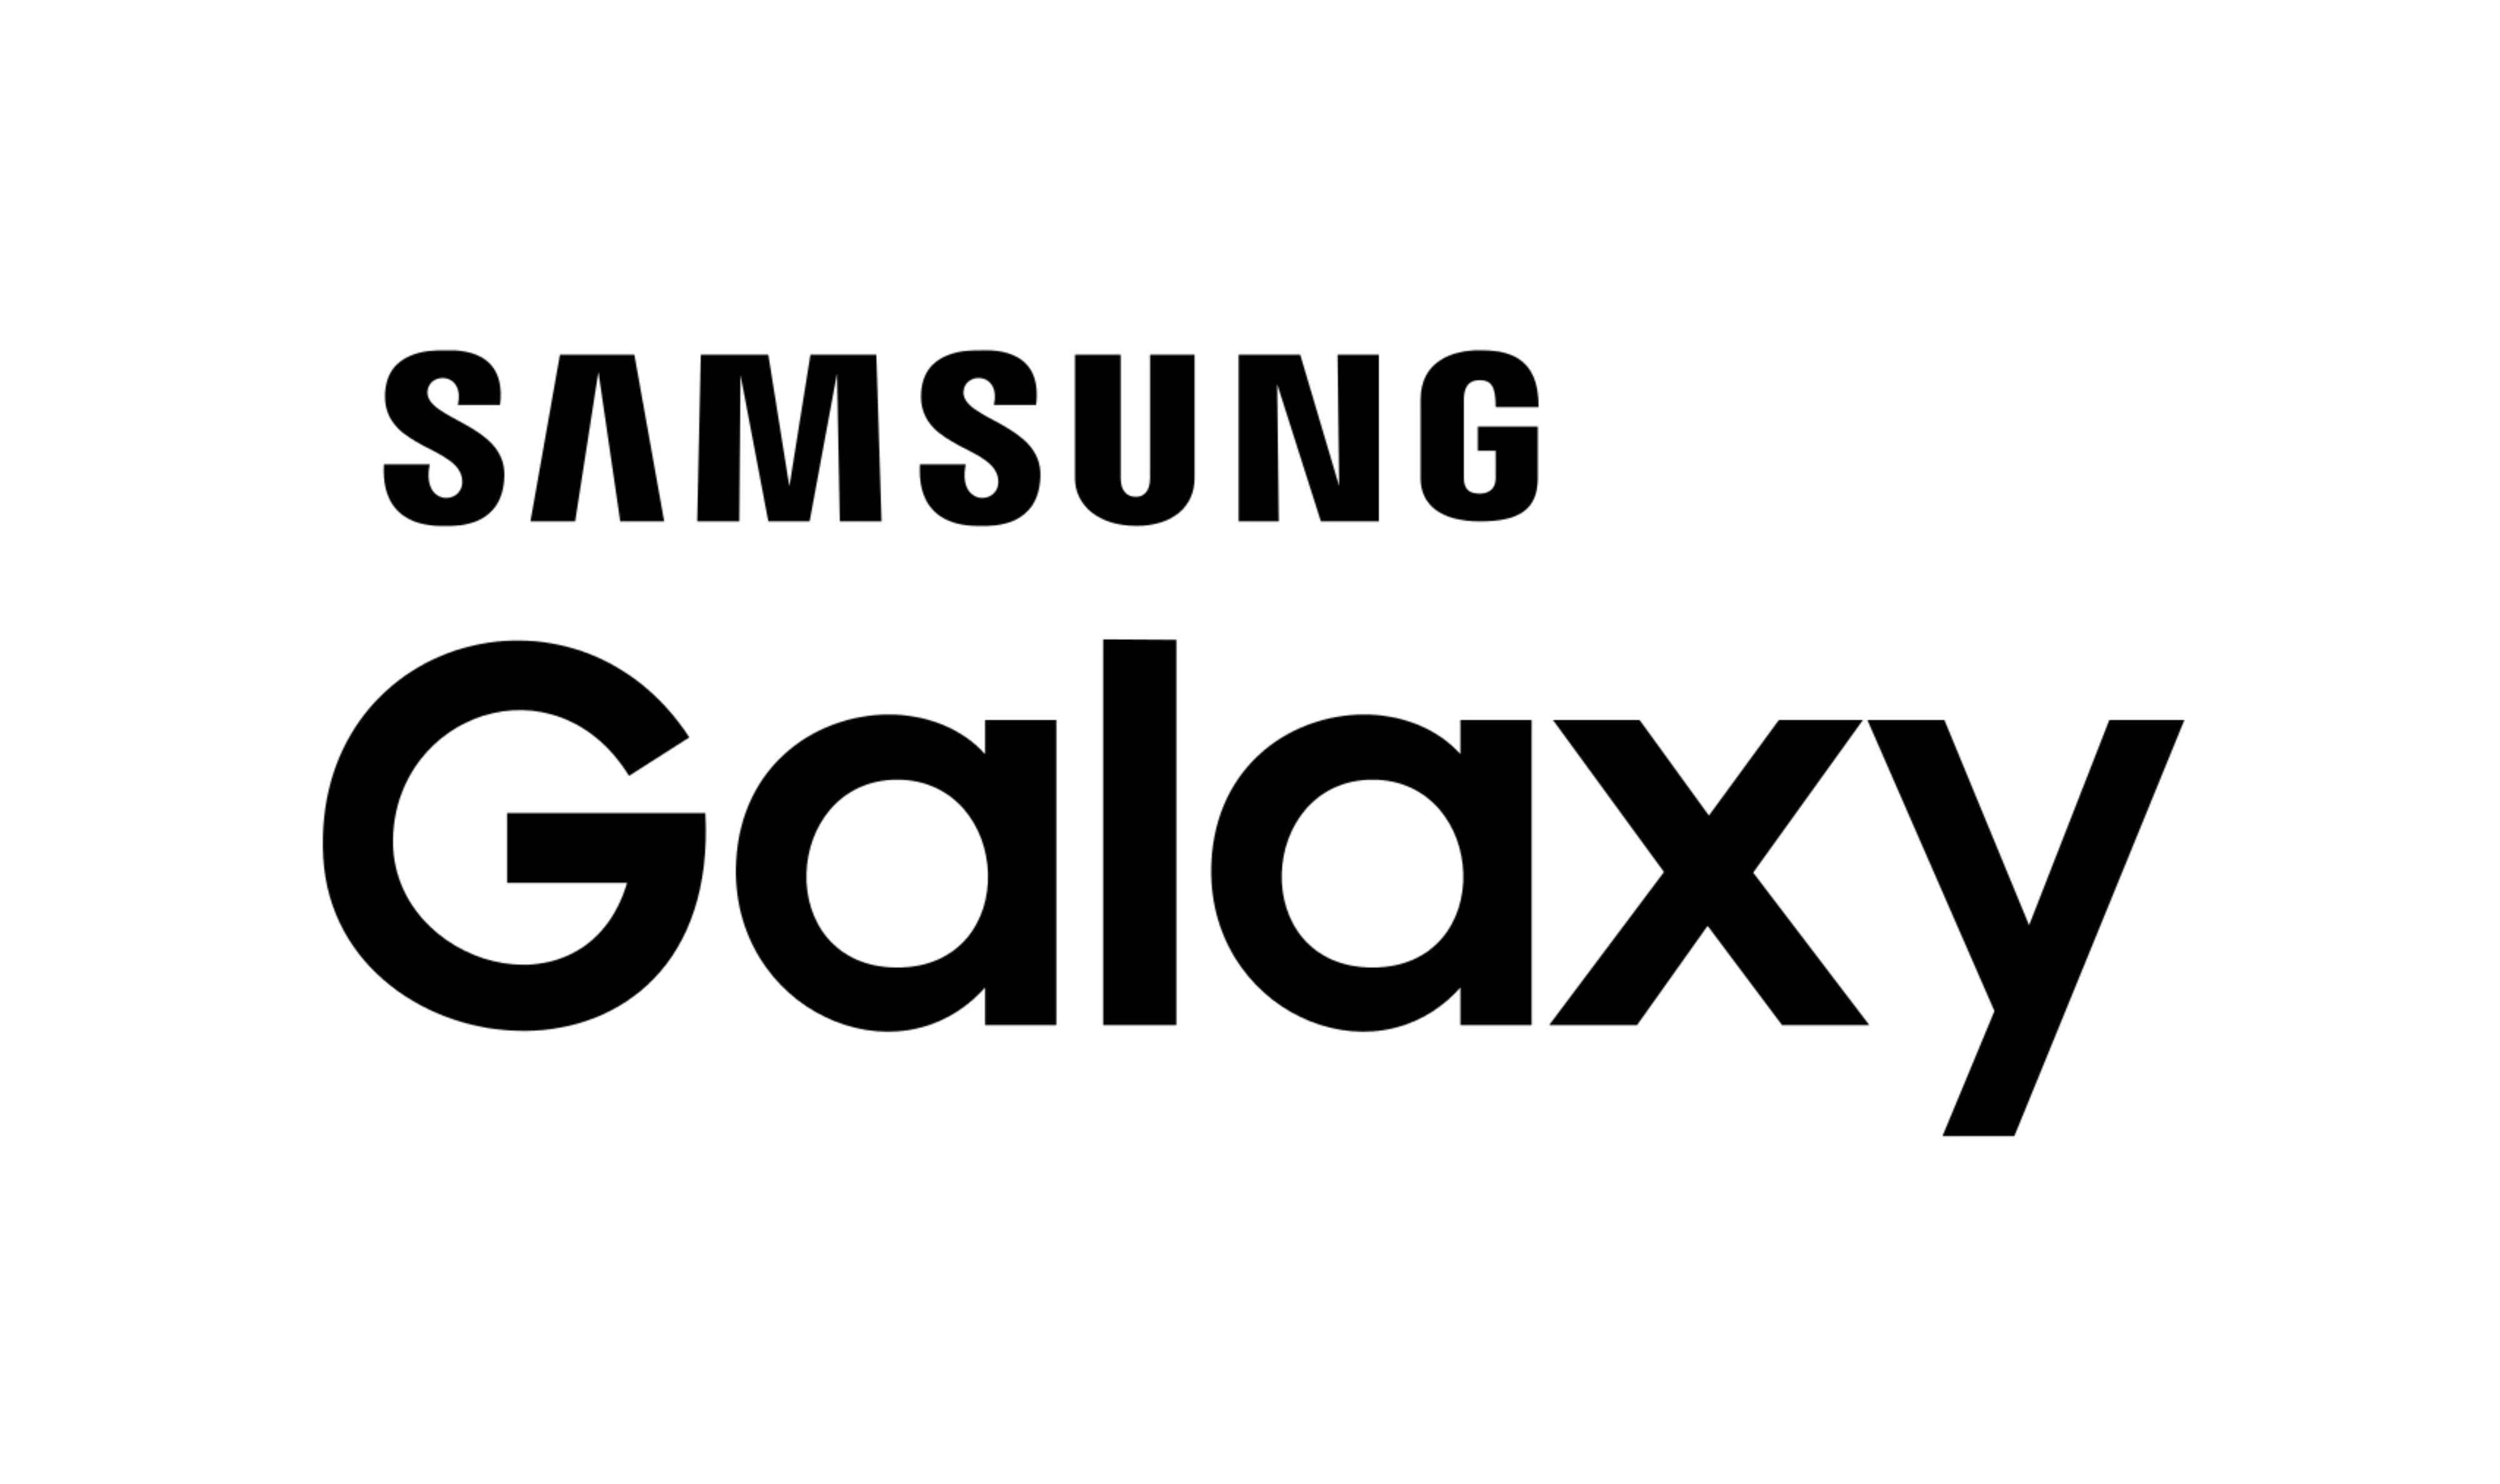 Galaxy Note20 FE branding appears on Samsung's website